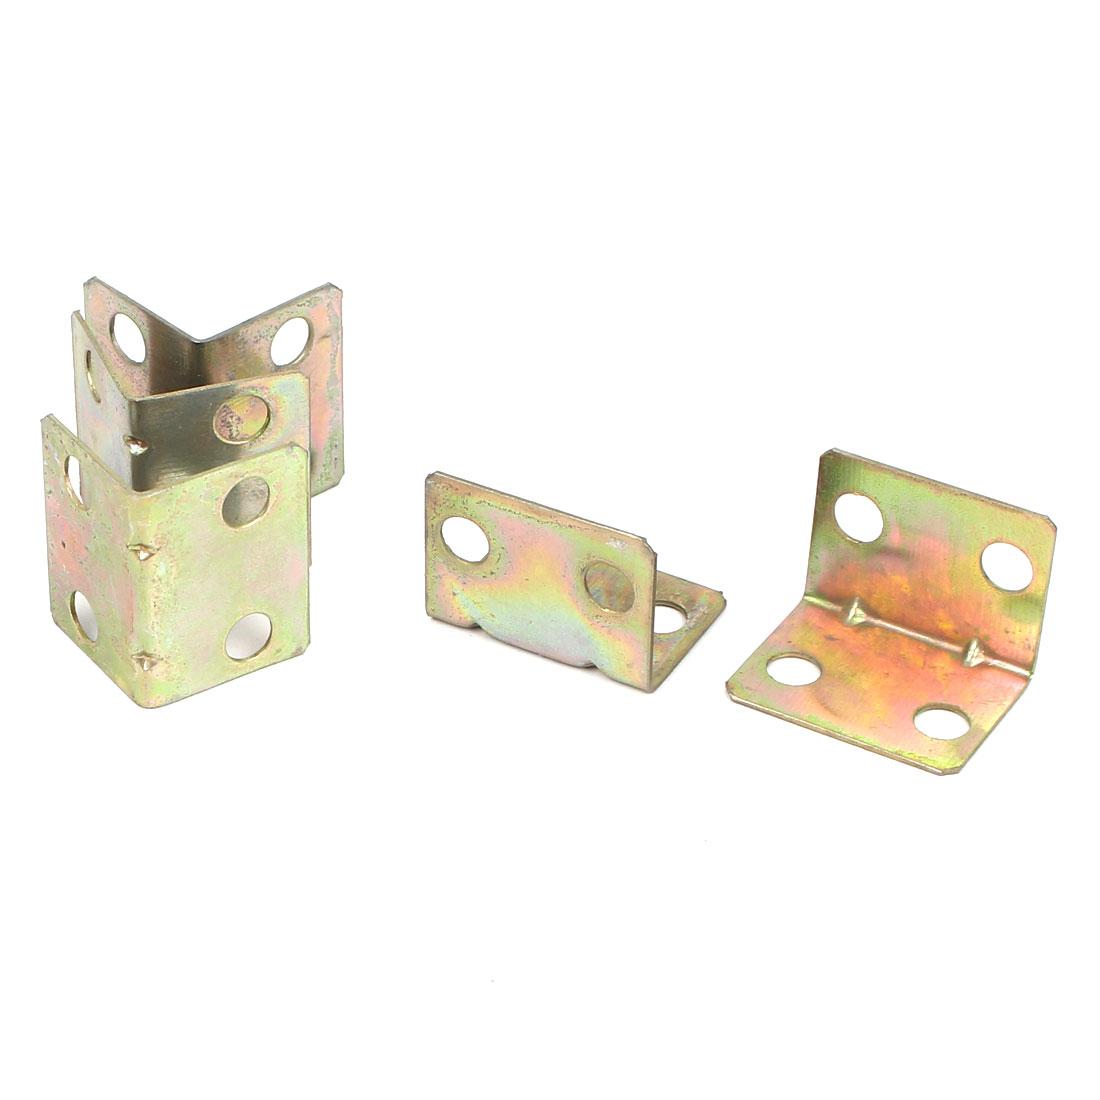 18mmx18mmx23mm L Shape Metal Corner Brace Angle Bracket 0.5mm Thickness 5pcs